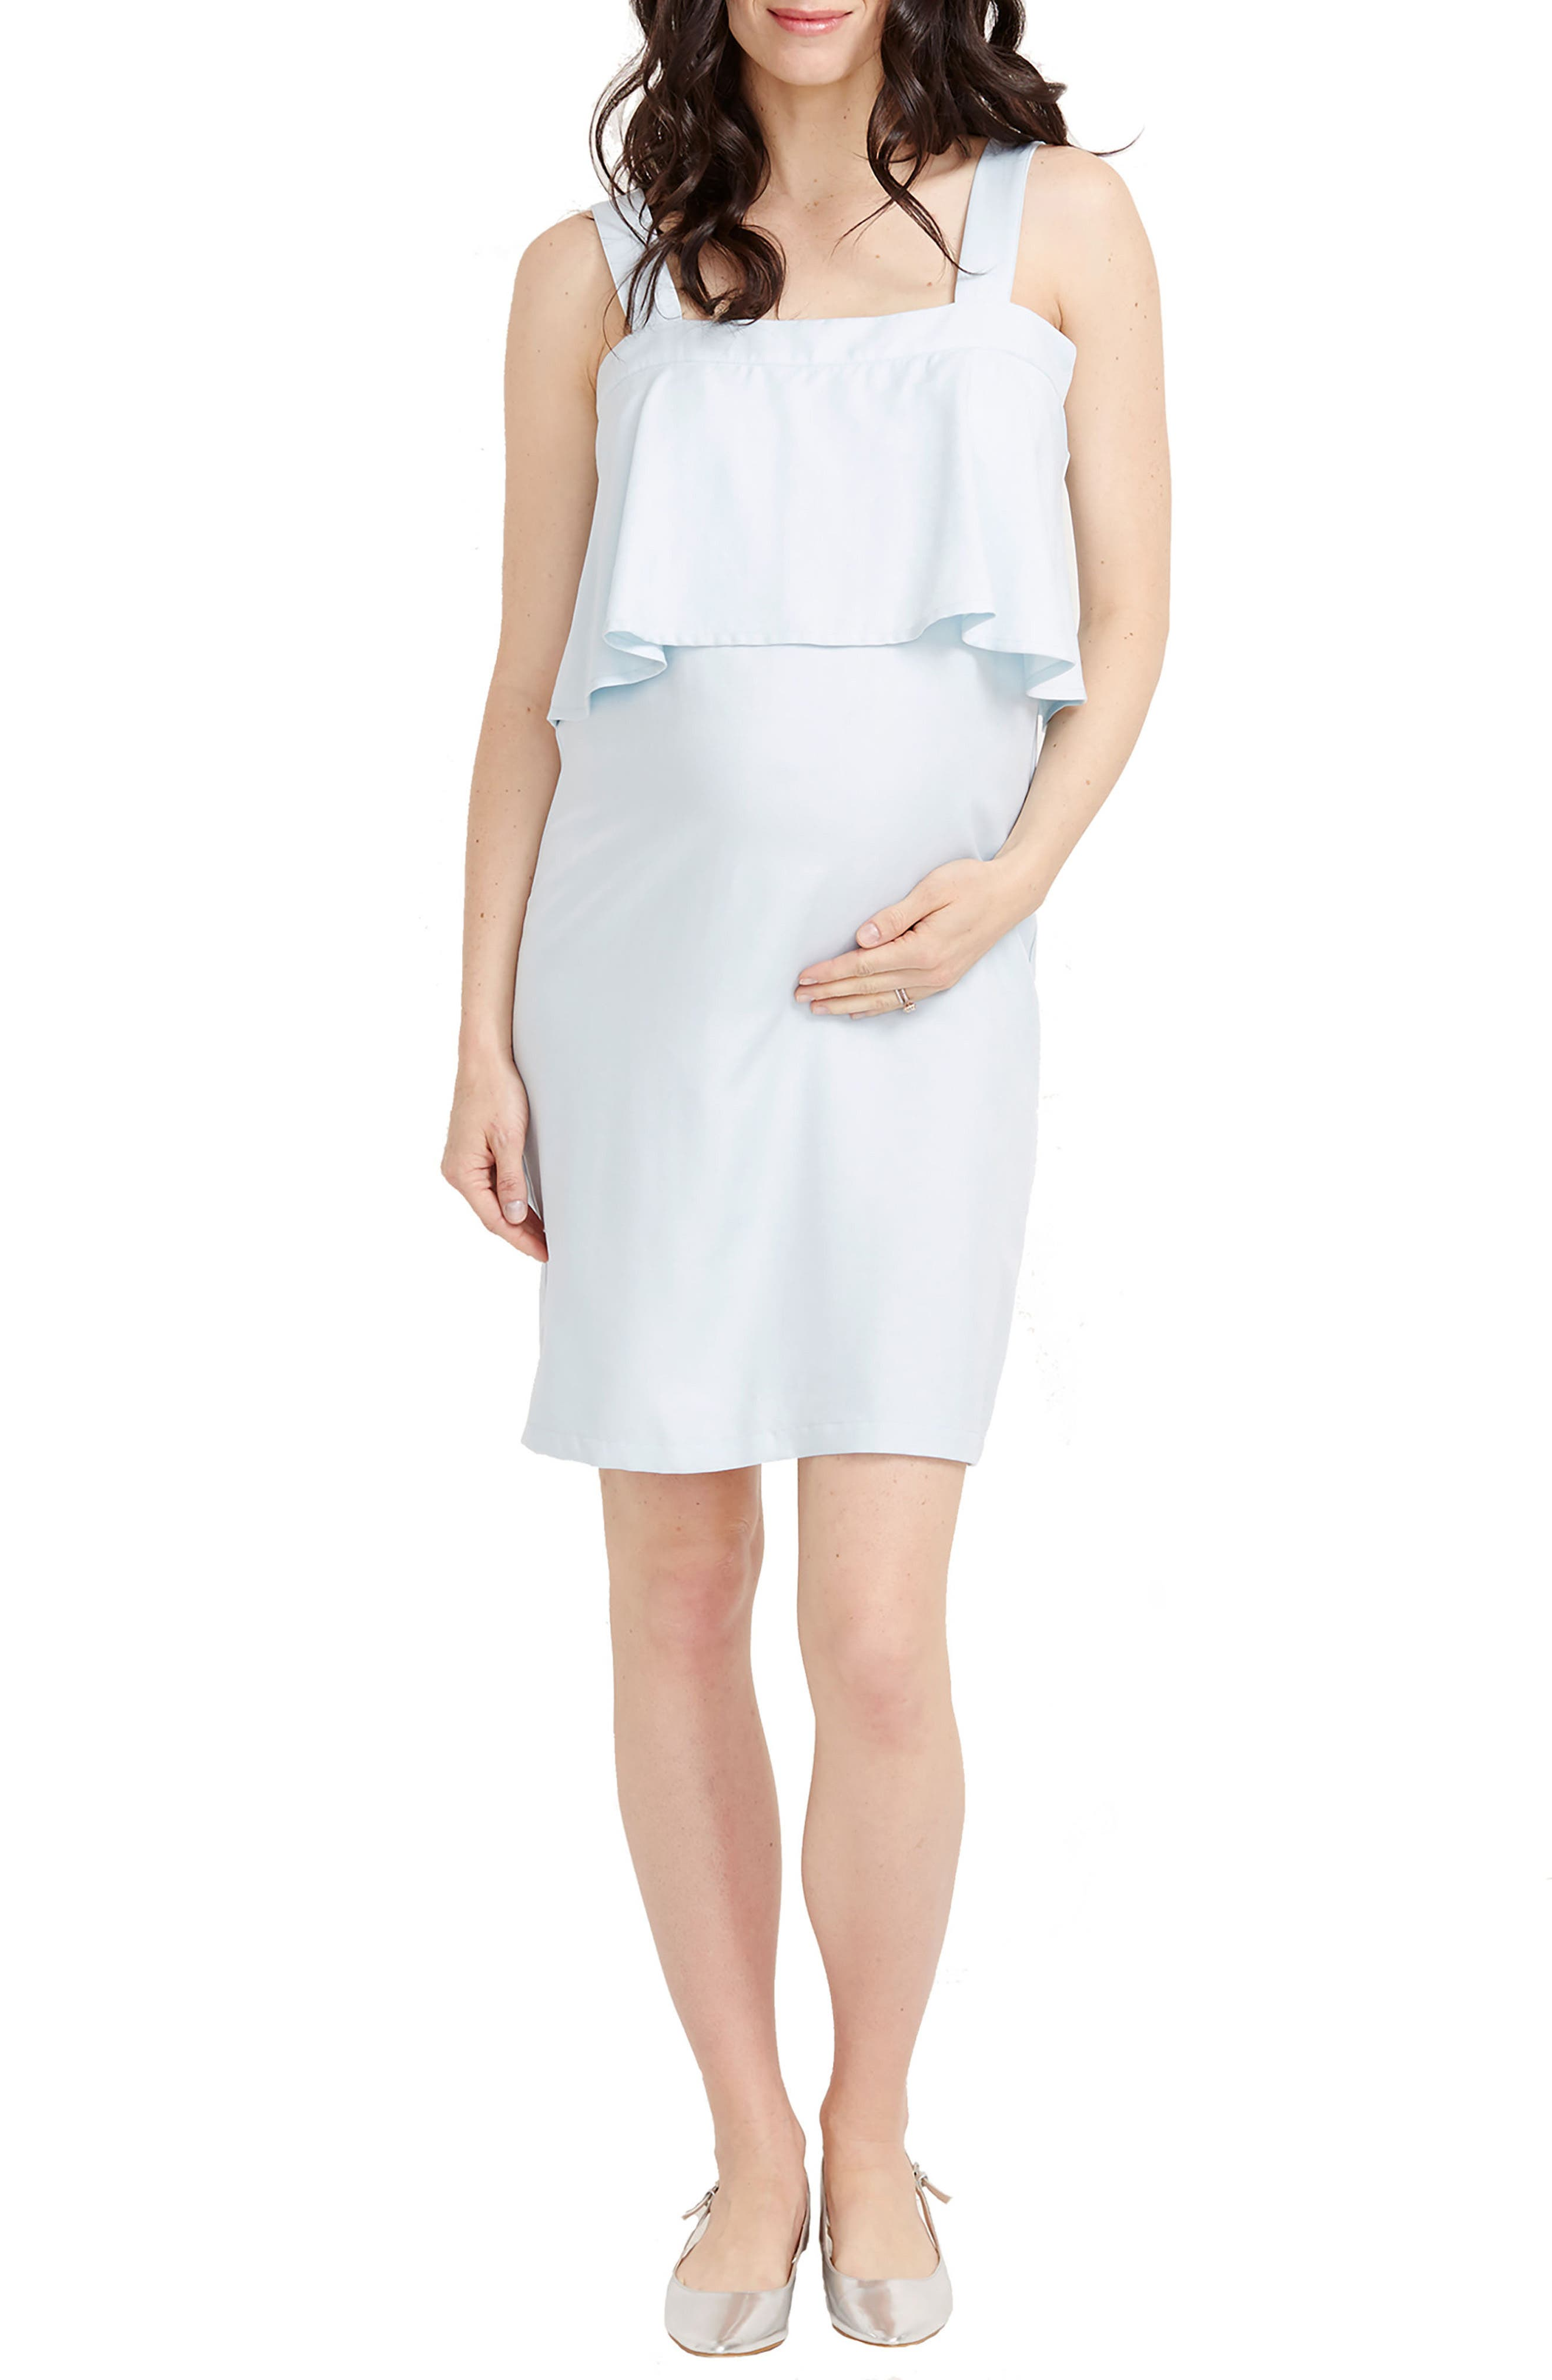 Rosie Pope Mia Maternity Dress